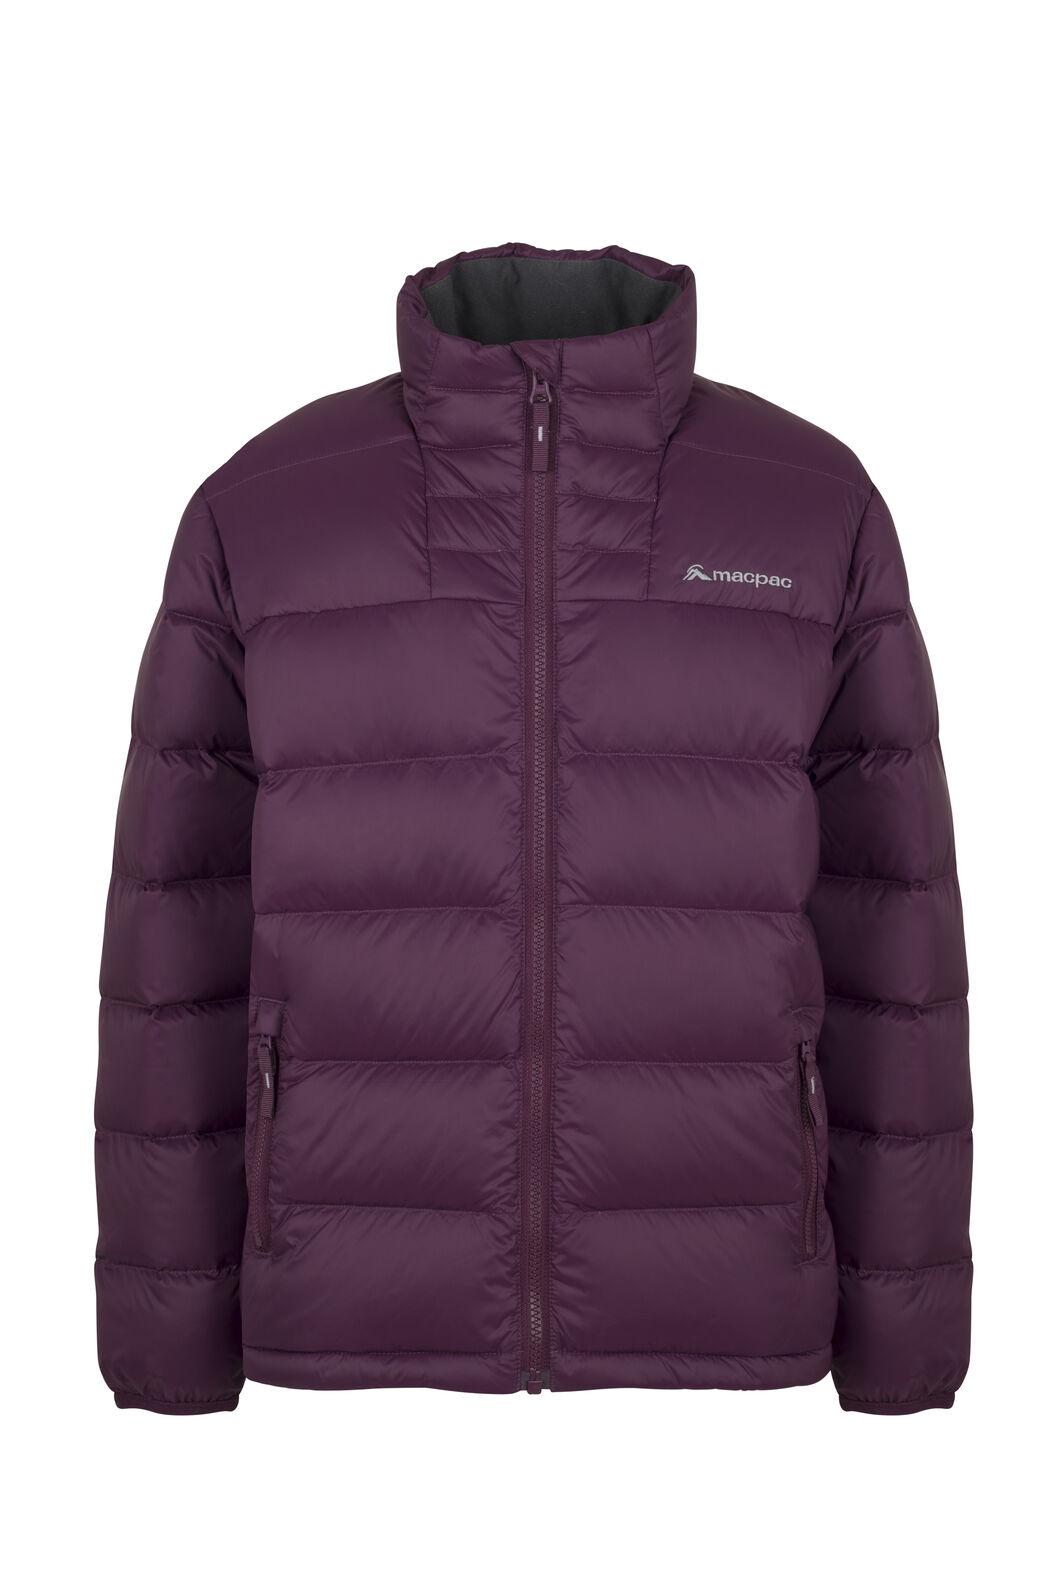 Macpac Atom Jacket - Kids', Potent Purple, hi-res